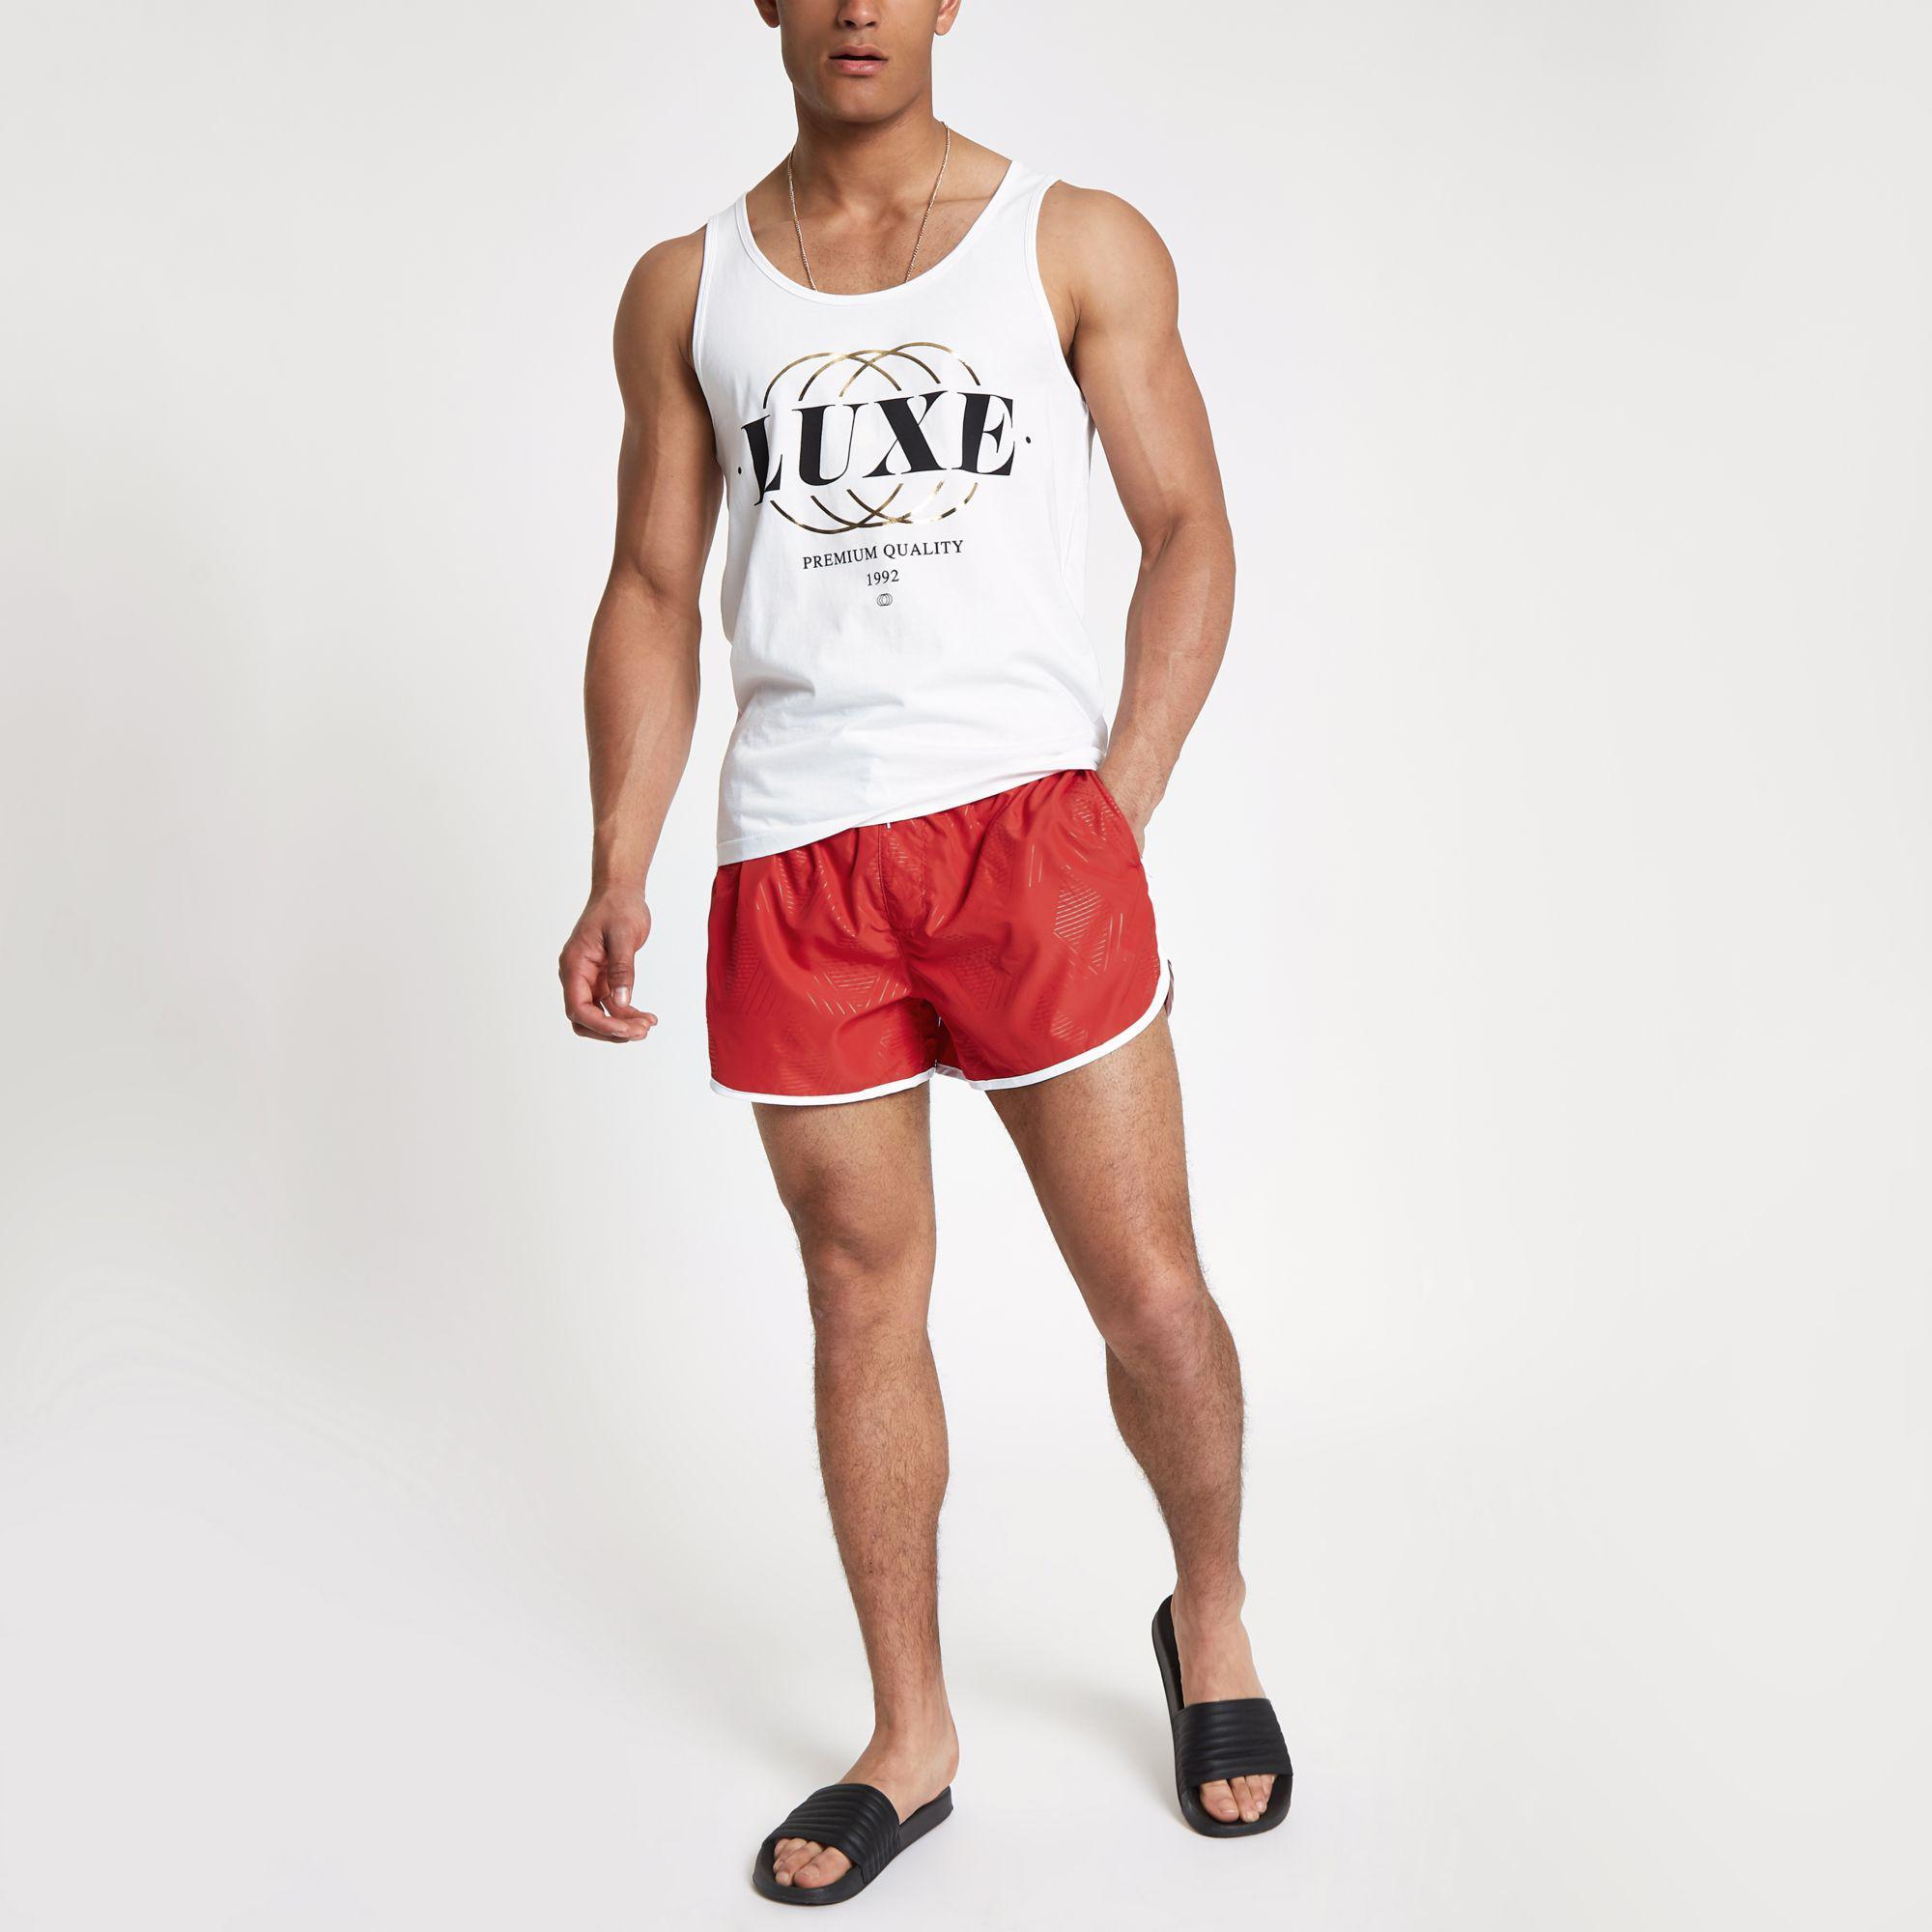 4b1beec2bb River Island Football Bolt Runner Swim Shorts in Red for Men - Lyst